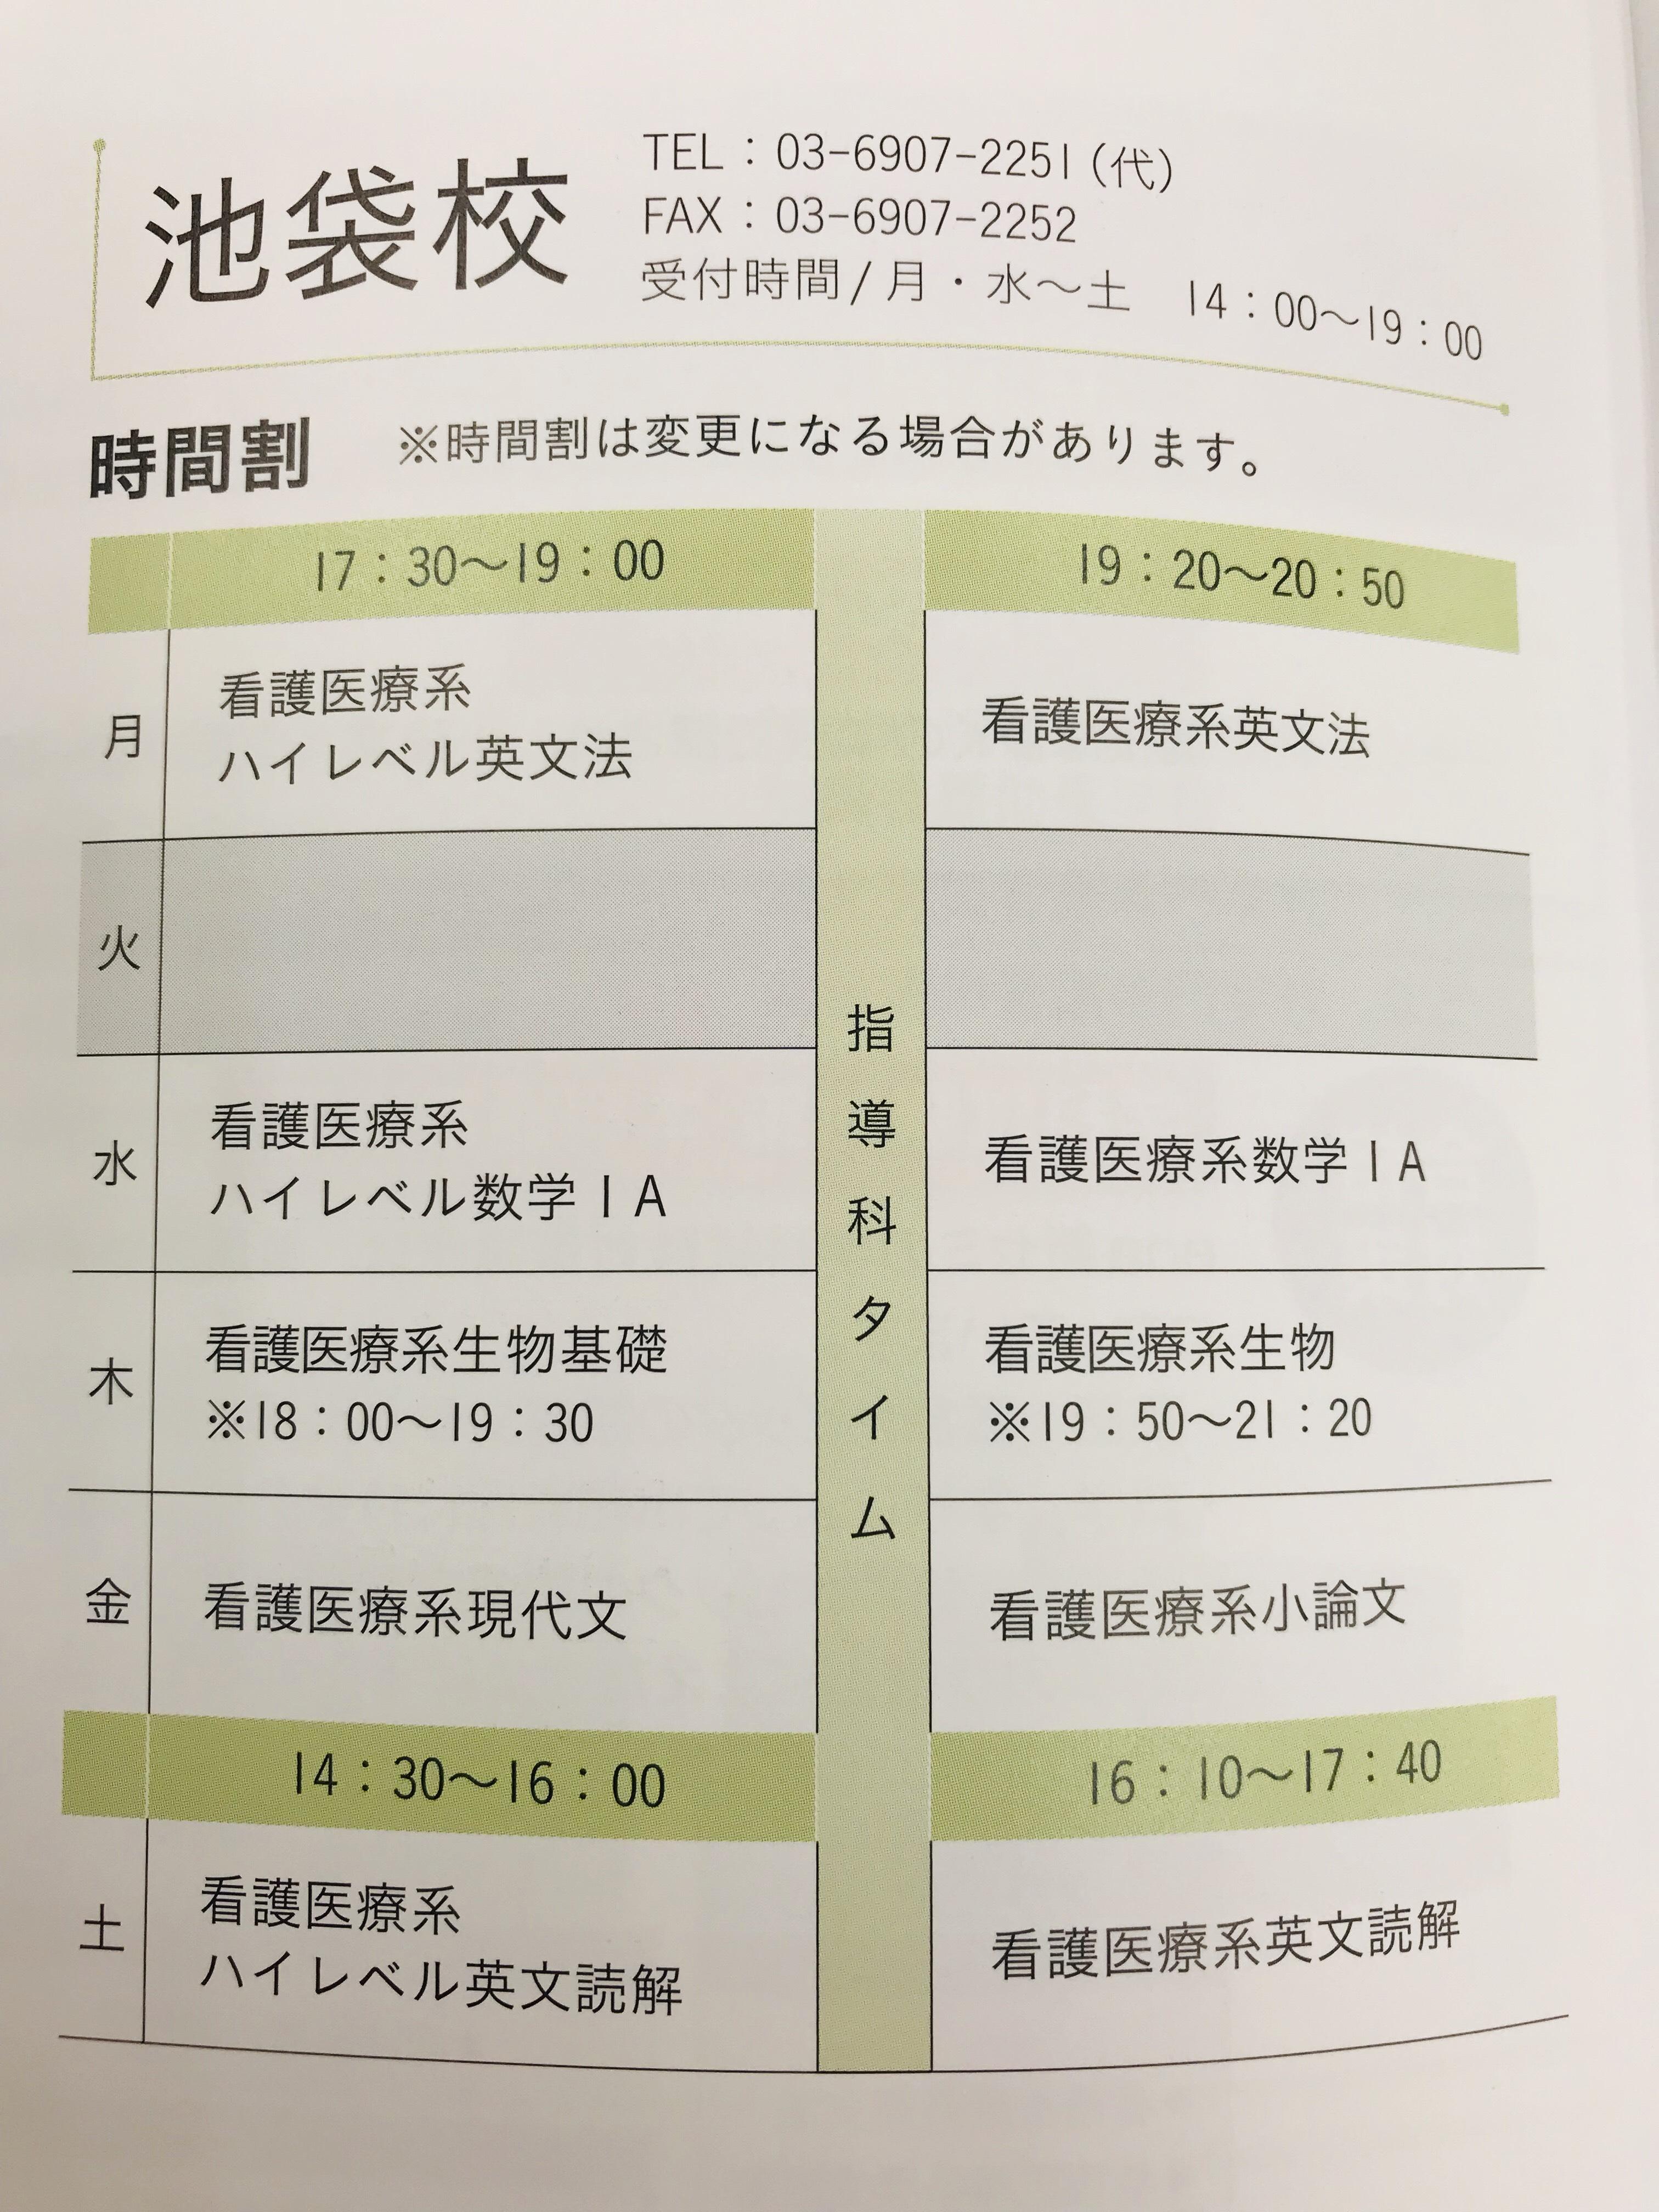 新セミ池袋校時間割 (1)